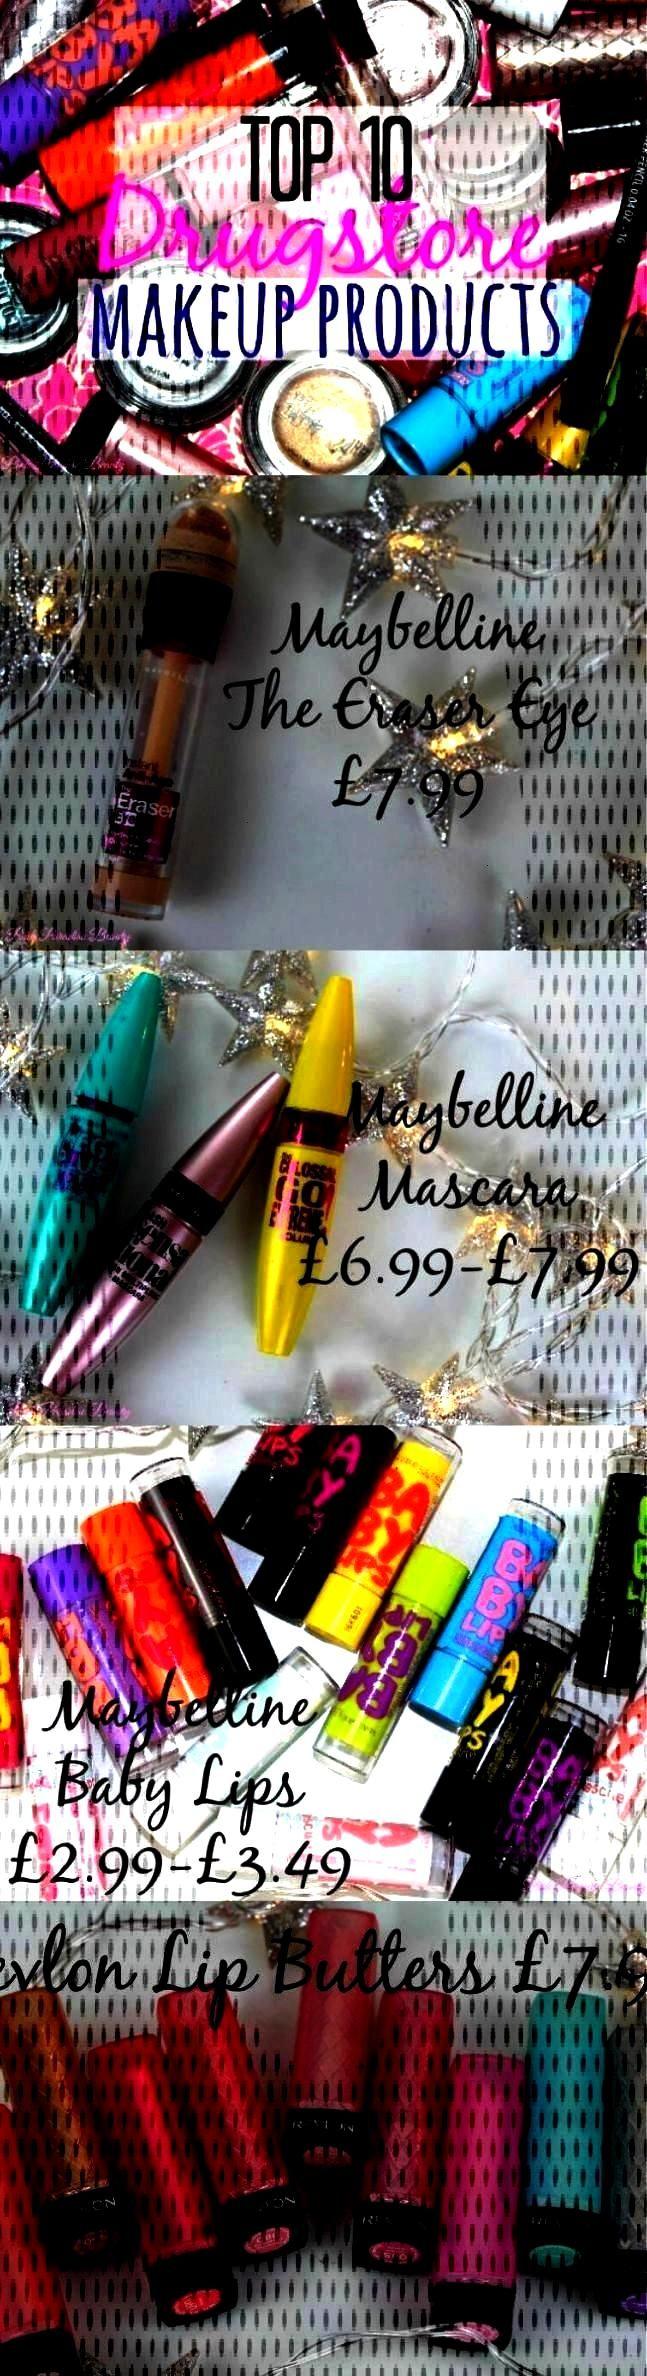 discount against makeup artist hiring salary salar